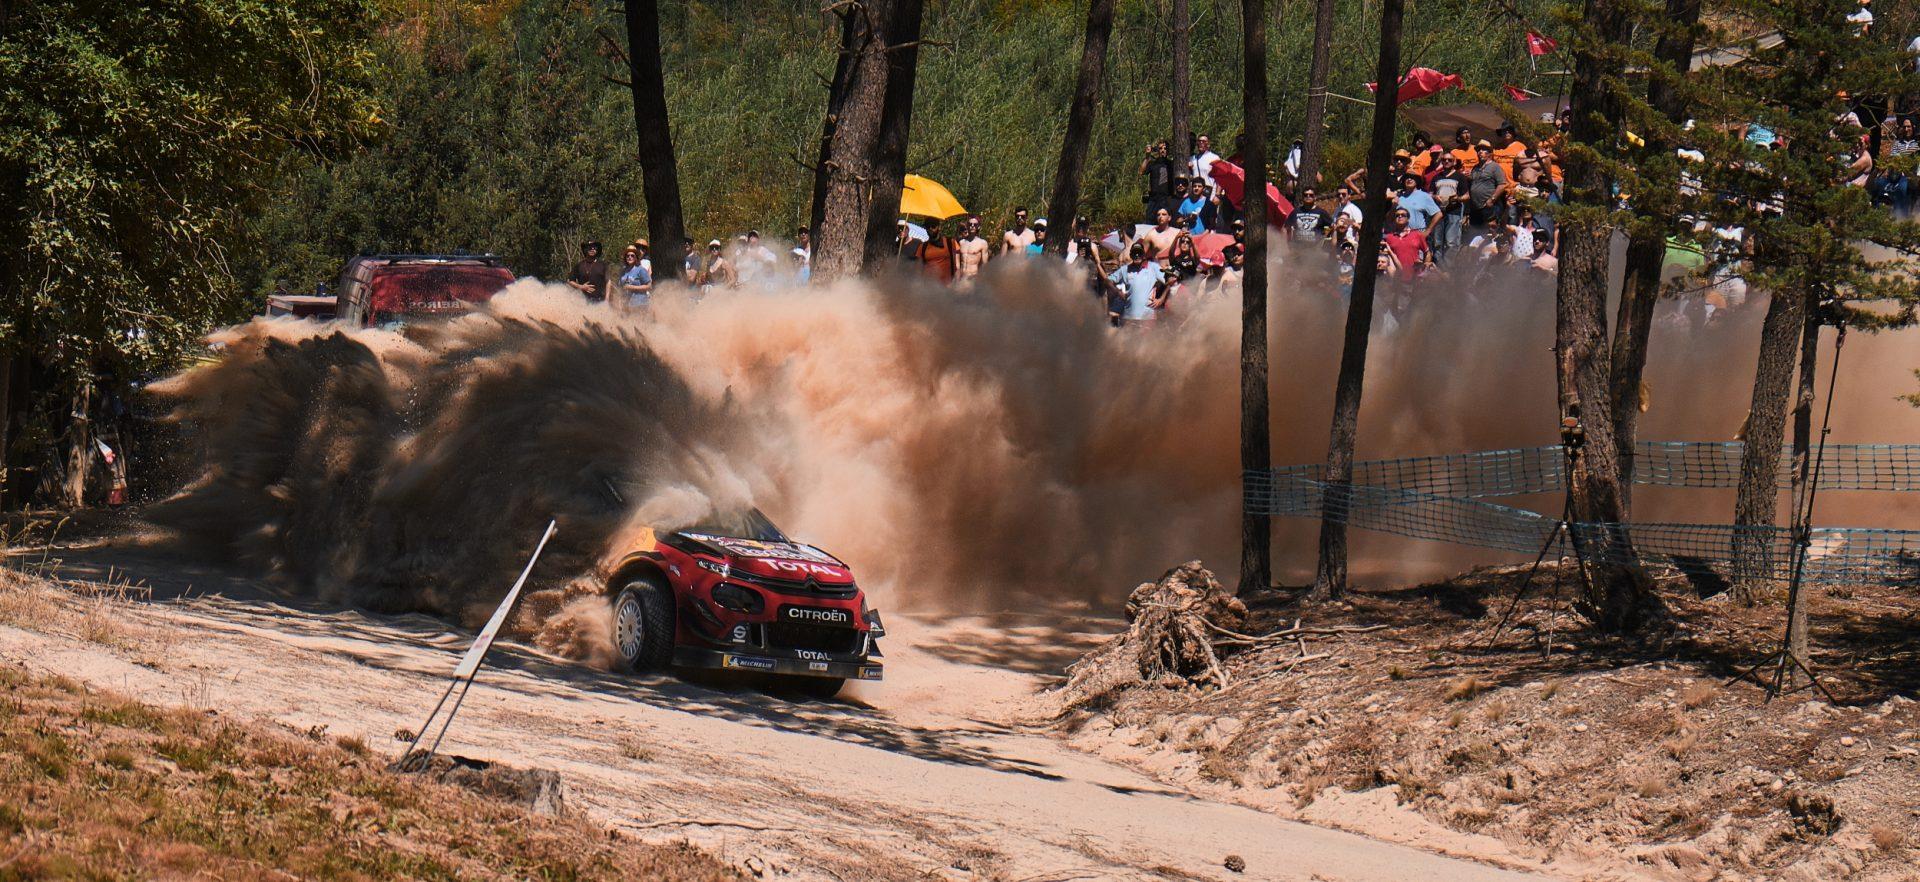 WRC Rally Portugal – Ritm excelent pentru Tempestini; podium general intr-un ecart de 9,2 secunde